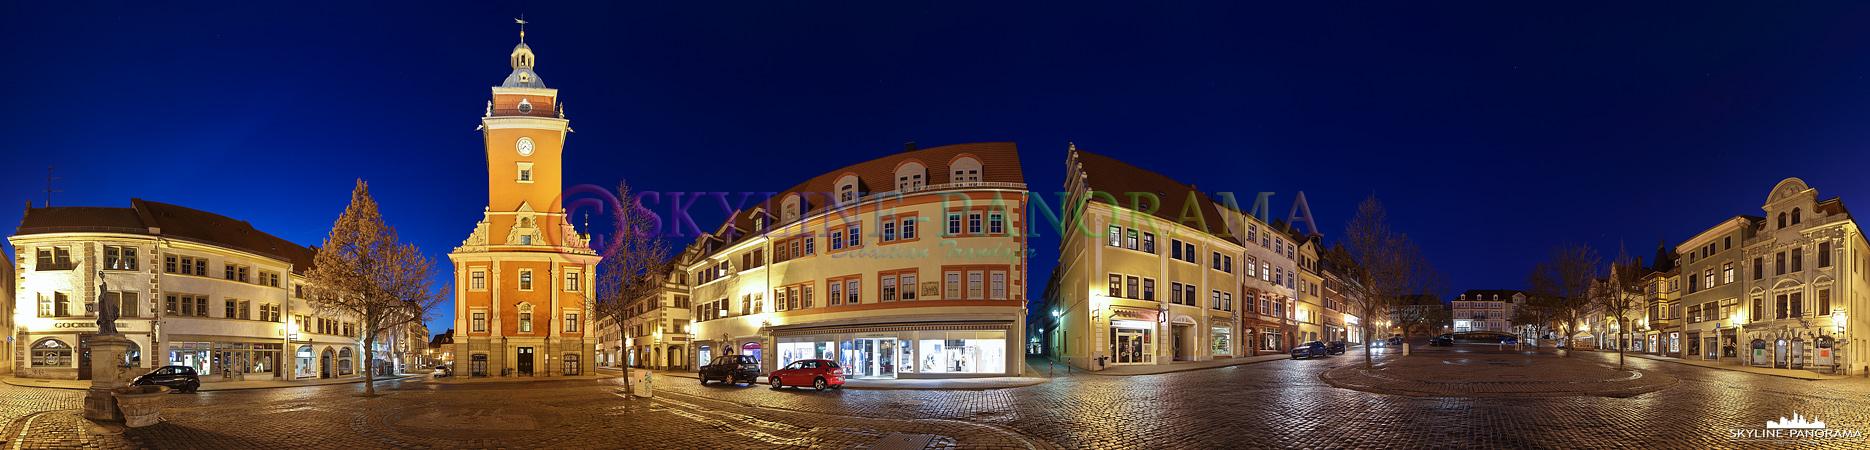 Gotha Rathaus Panorama